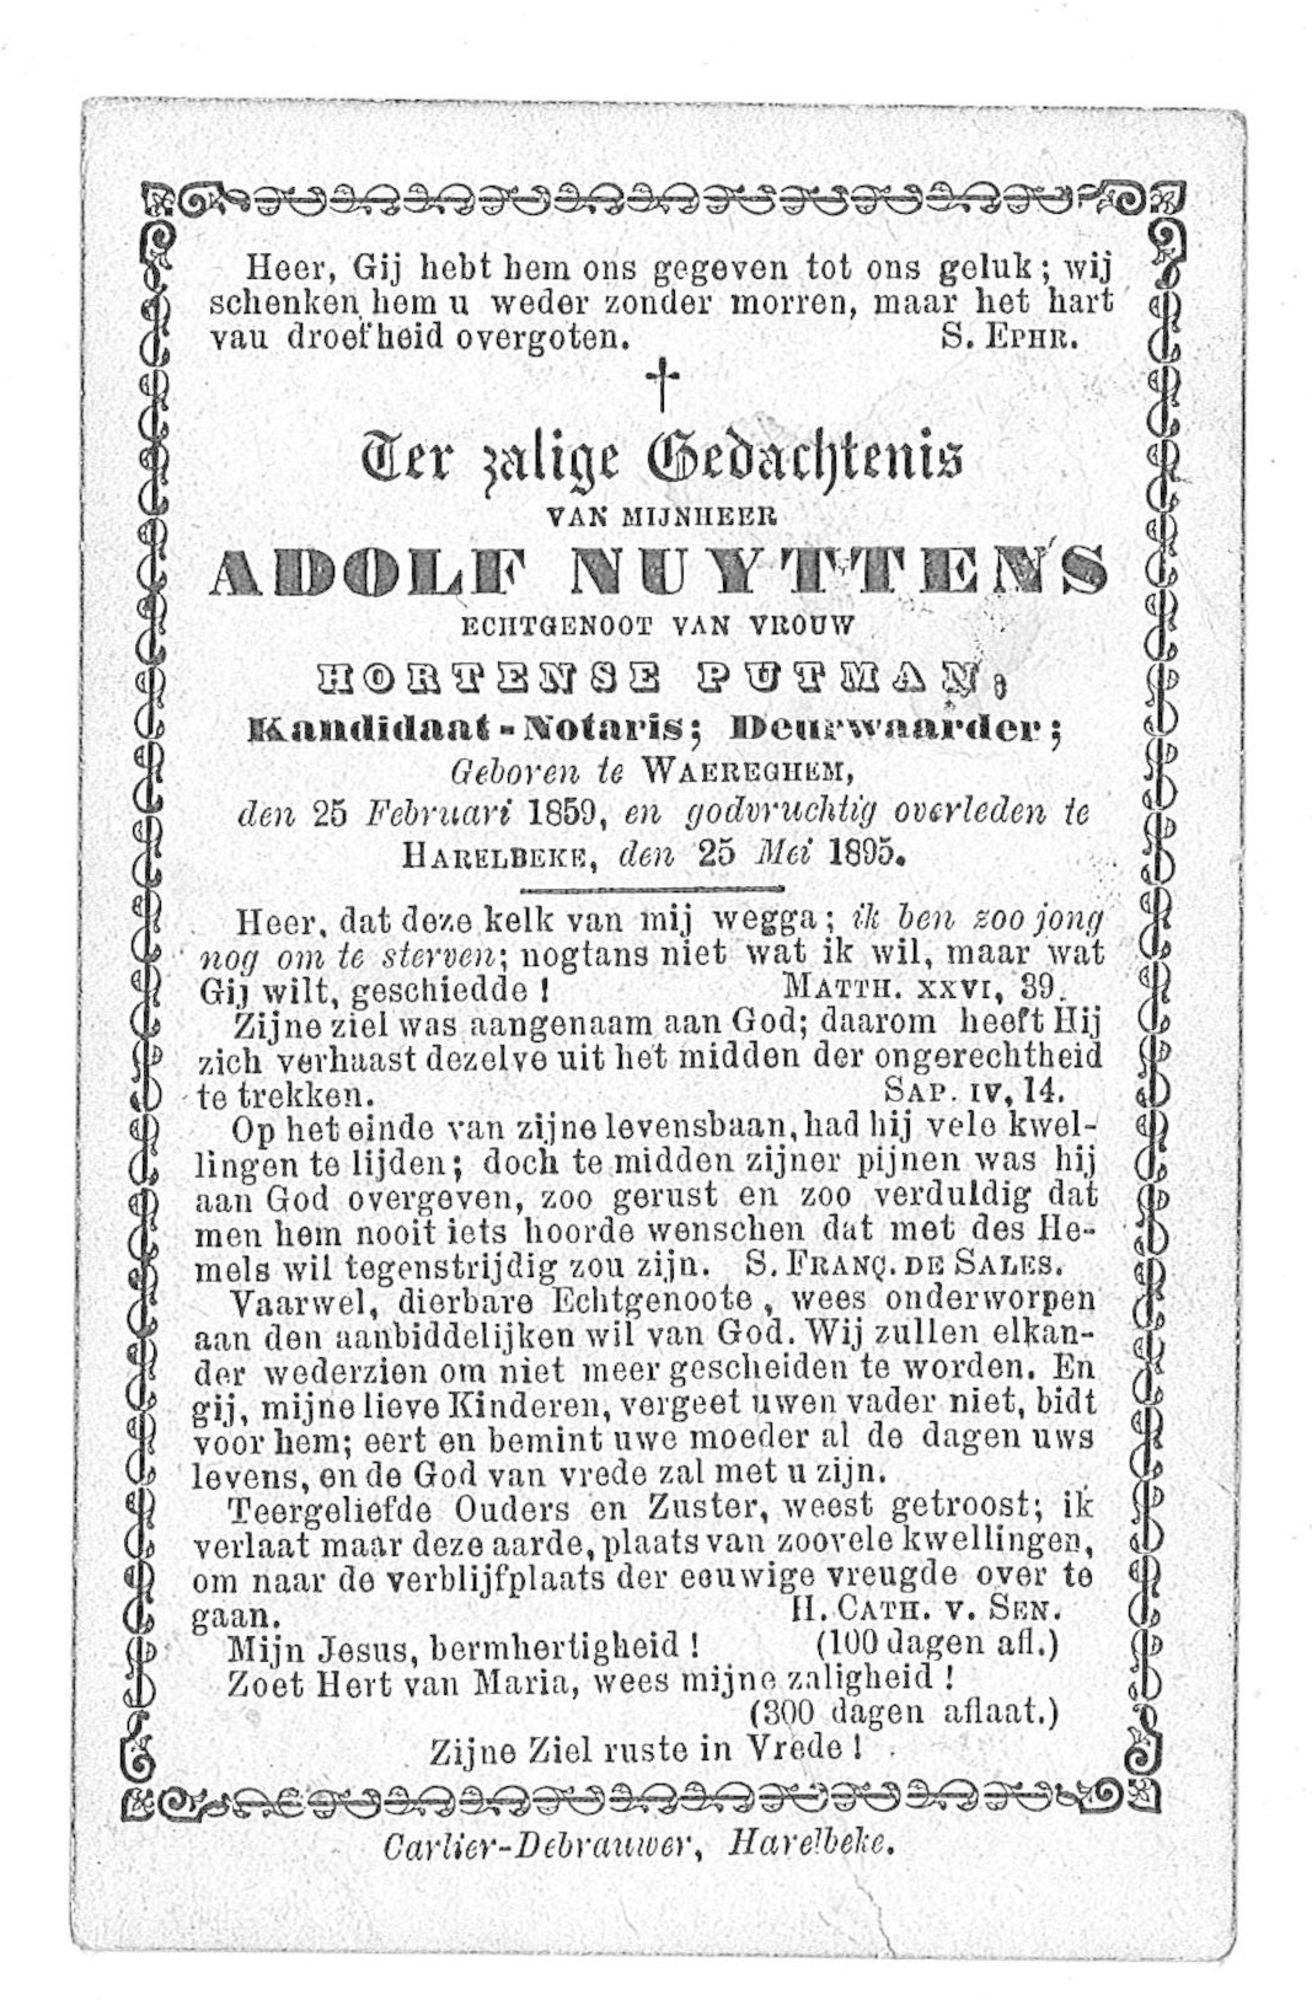 Adolf Nuyttens